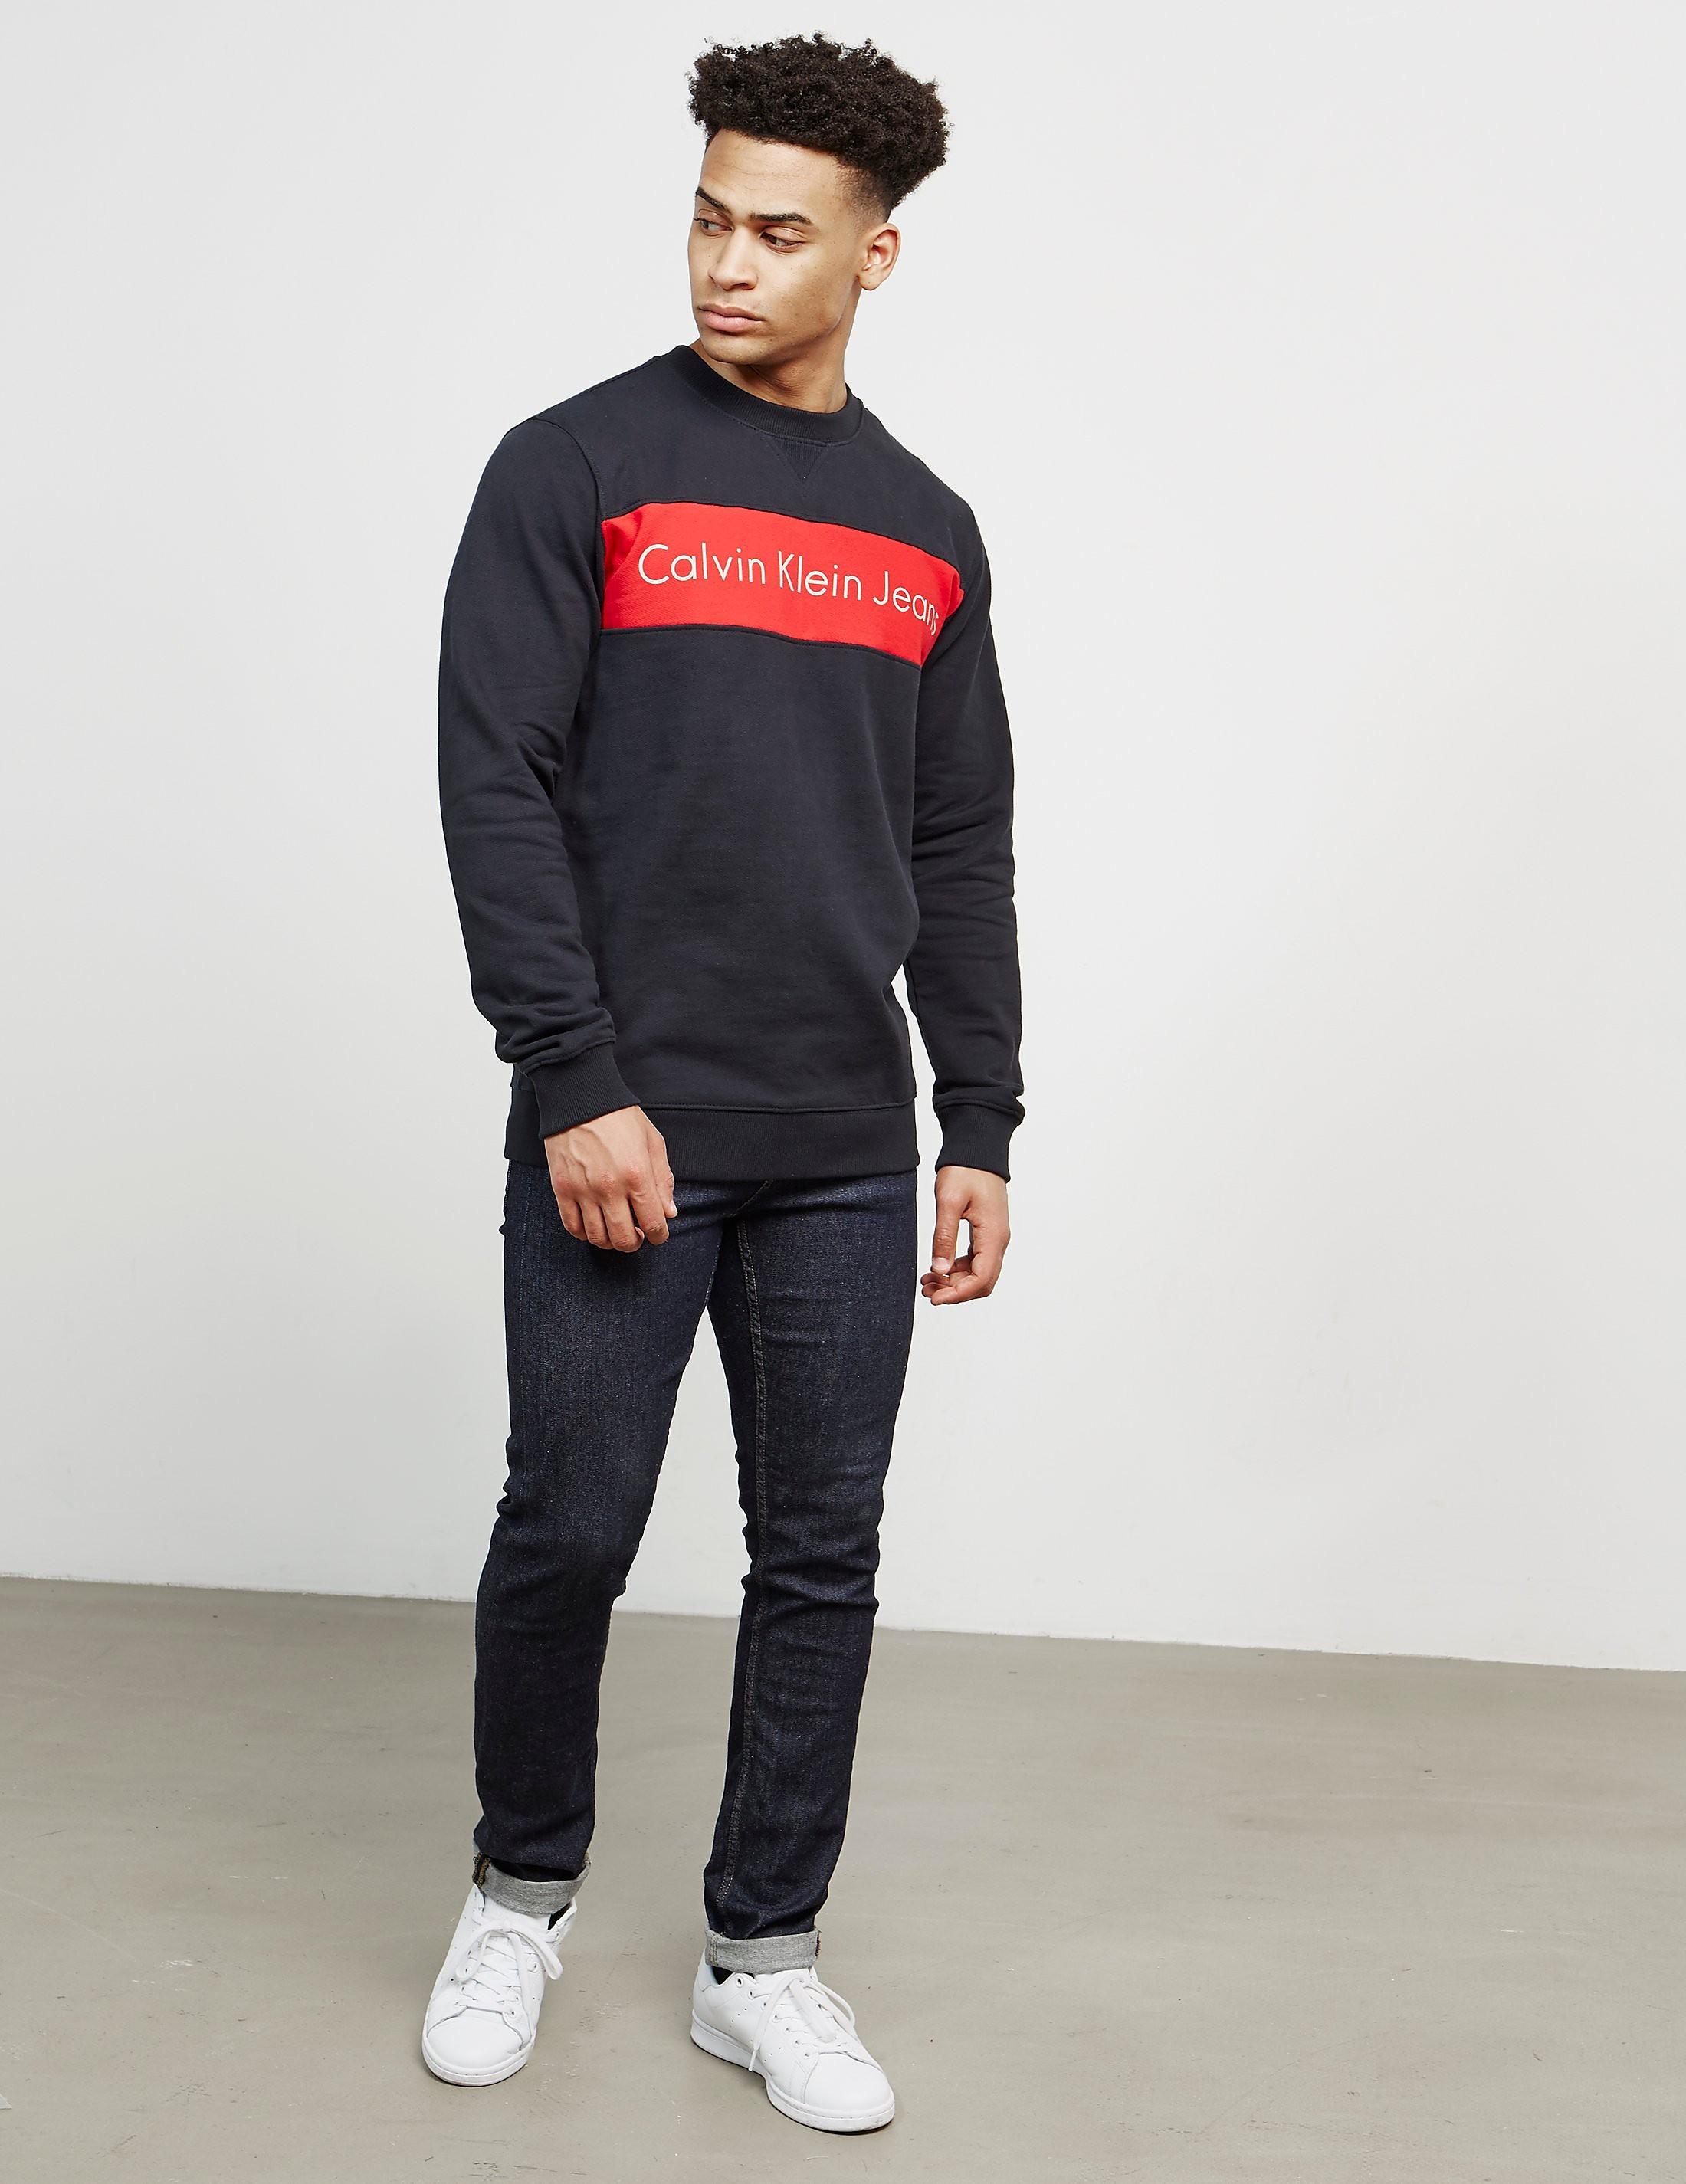 Calvin Klein Hayo Crew Sweatshirt